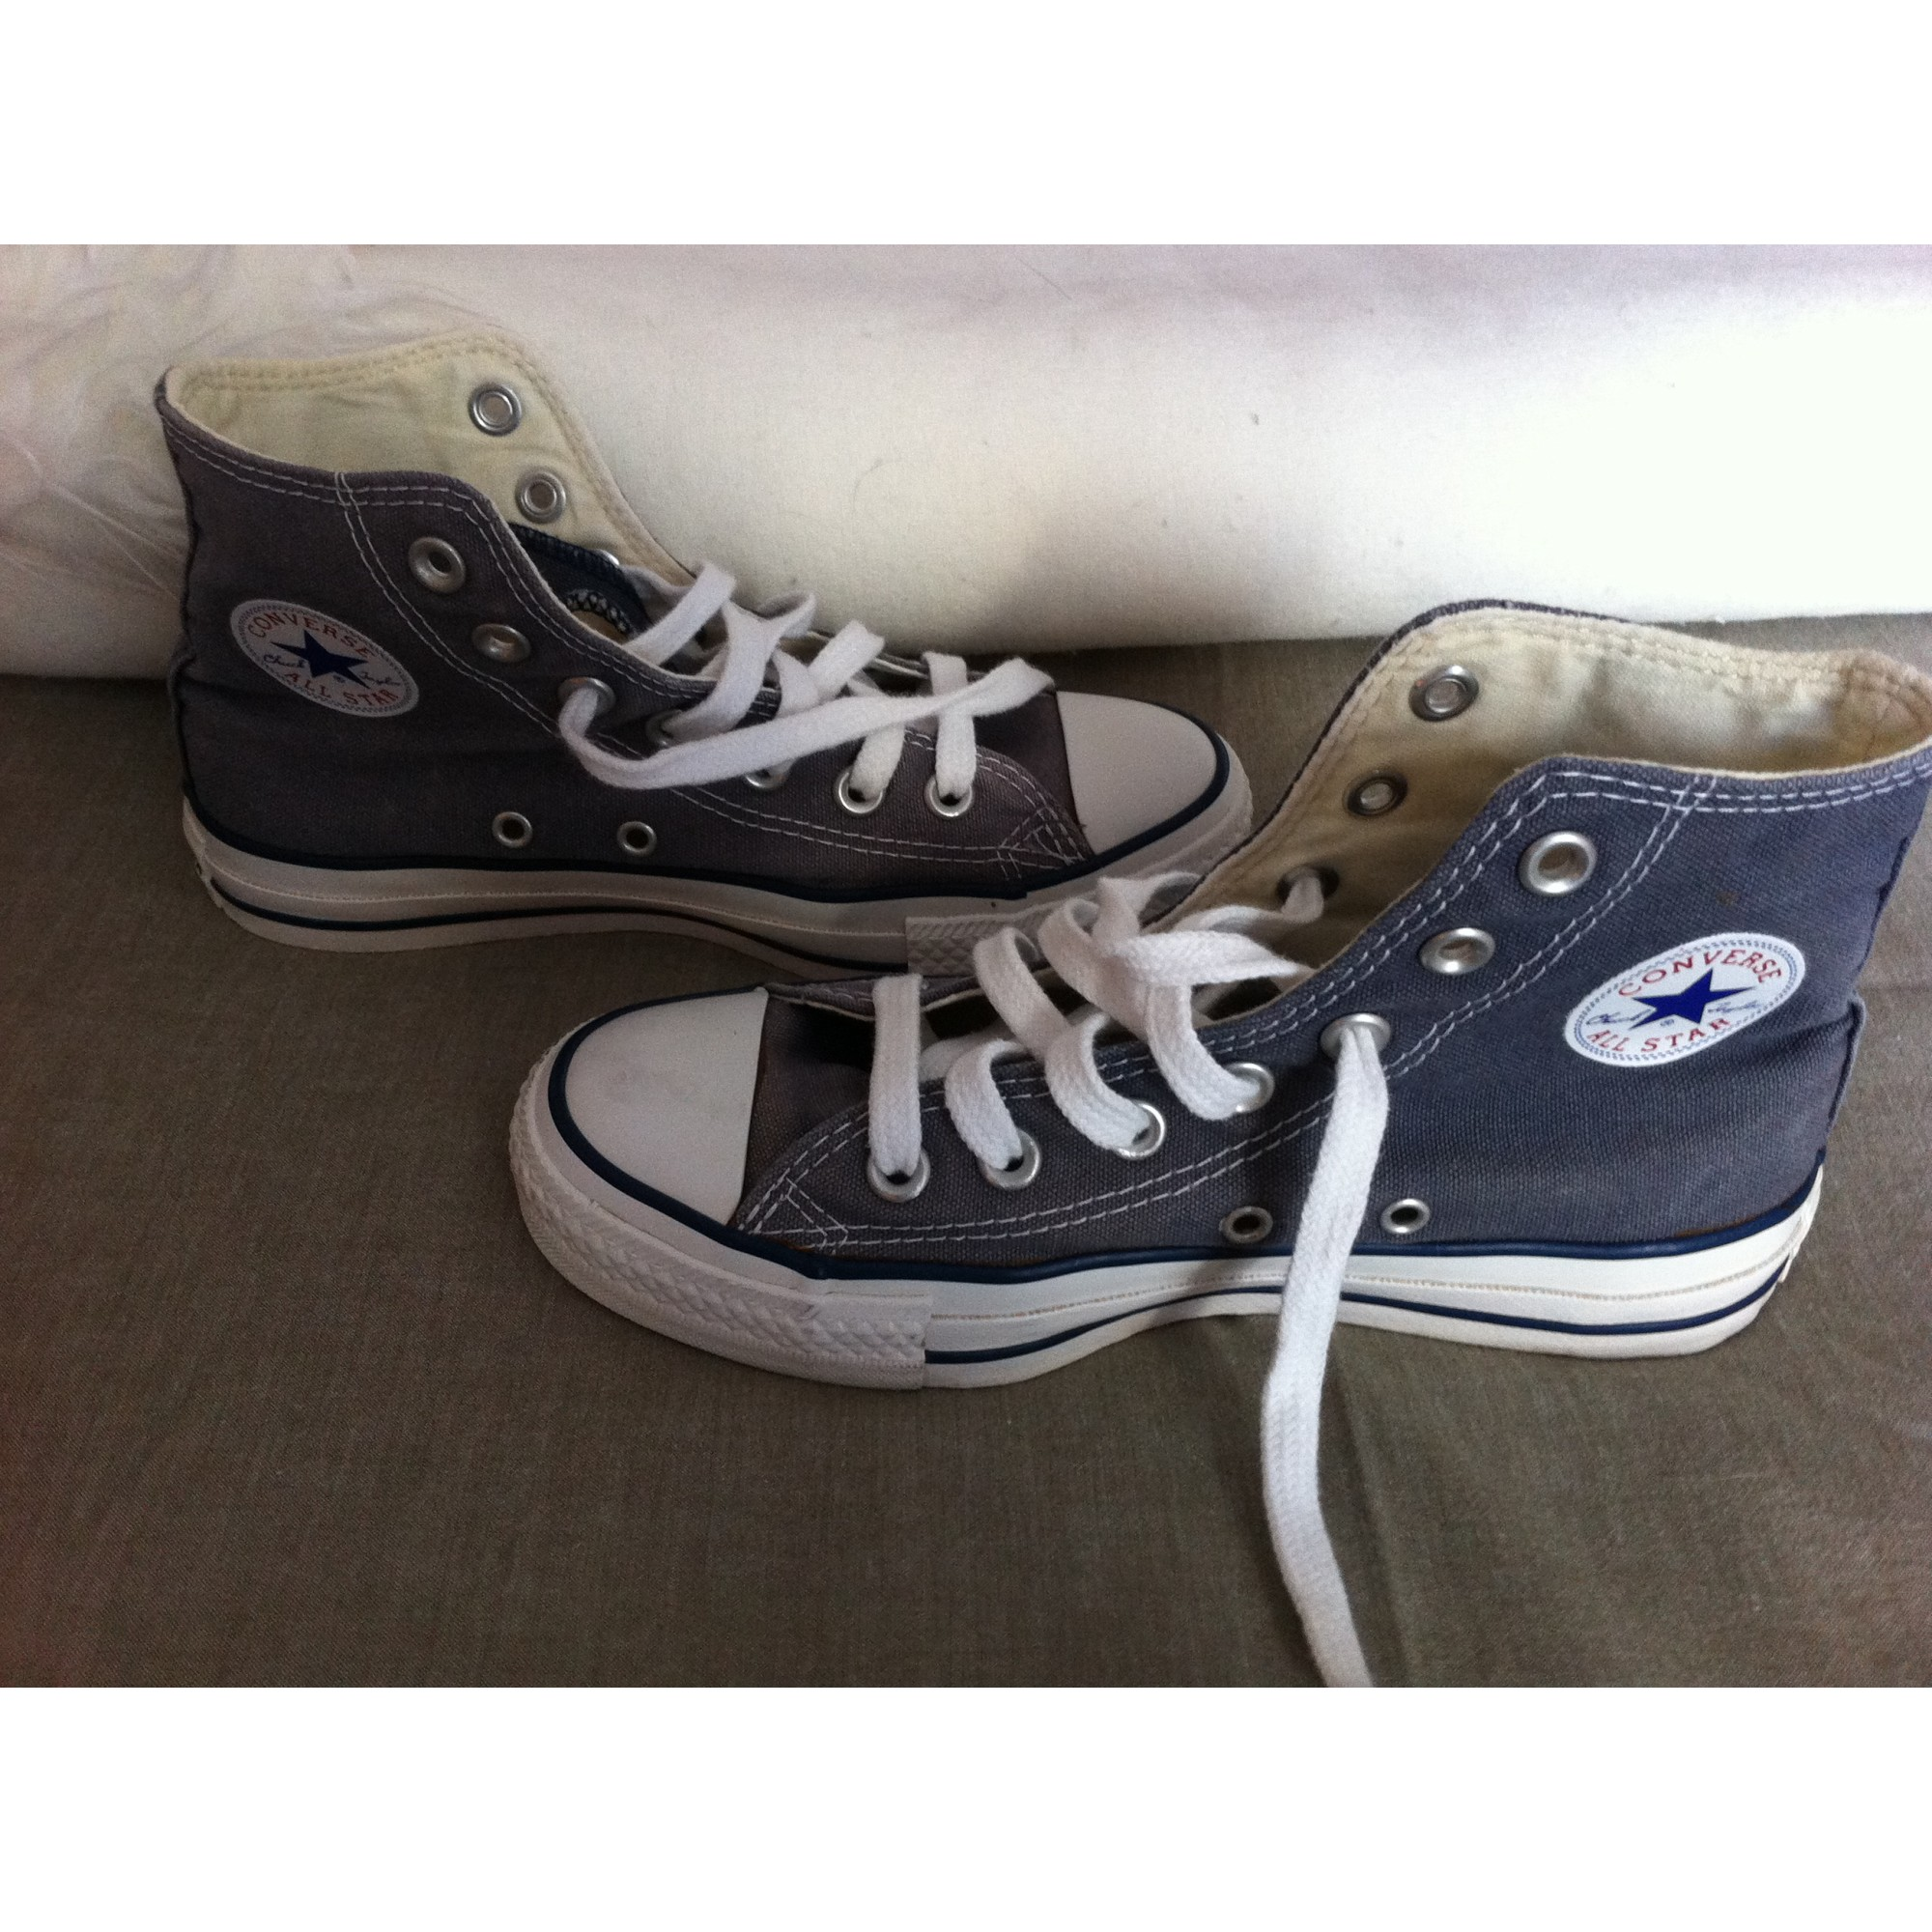 a163a00ce77f3 Chaussures de sport CONVERSE 35 bleu vendu par Soblanc - 7286765